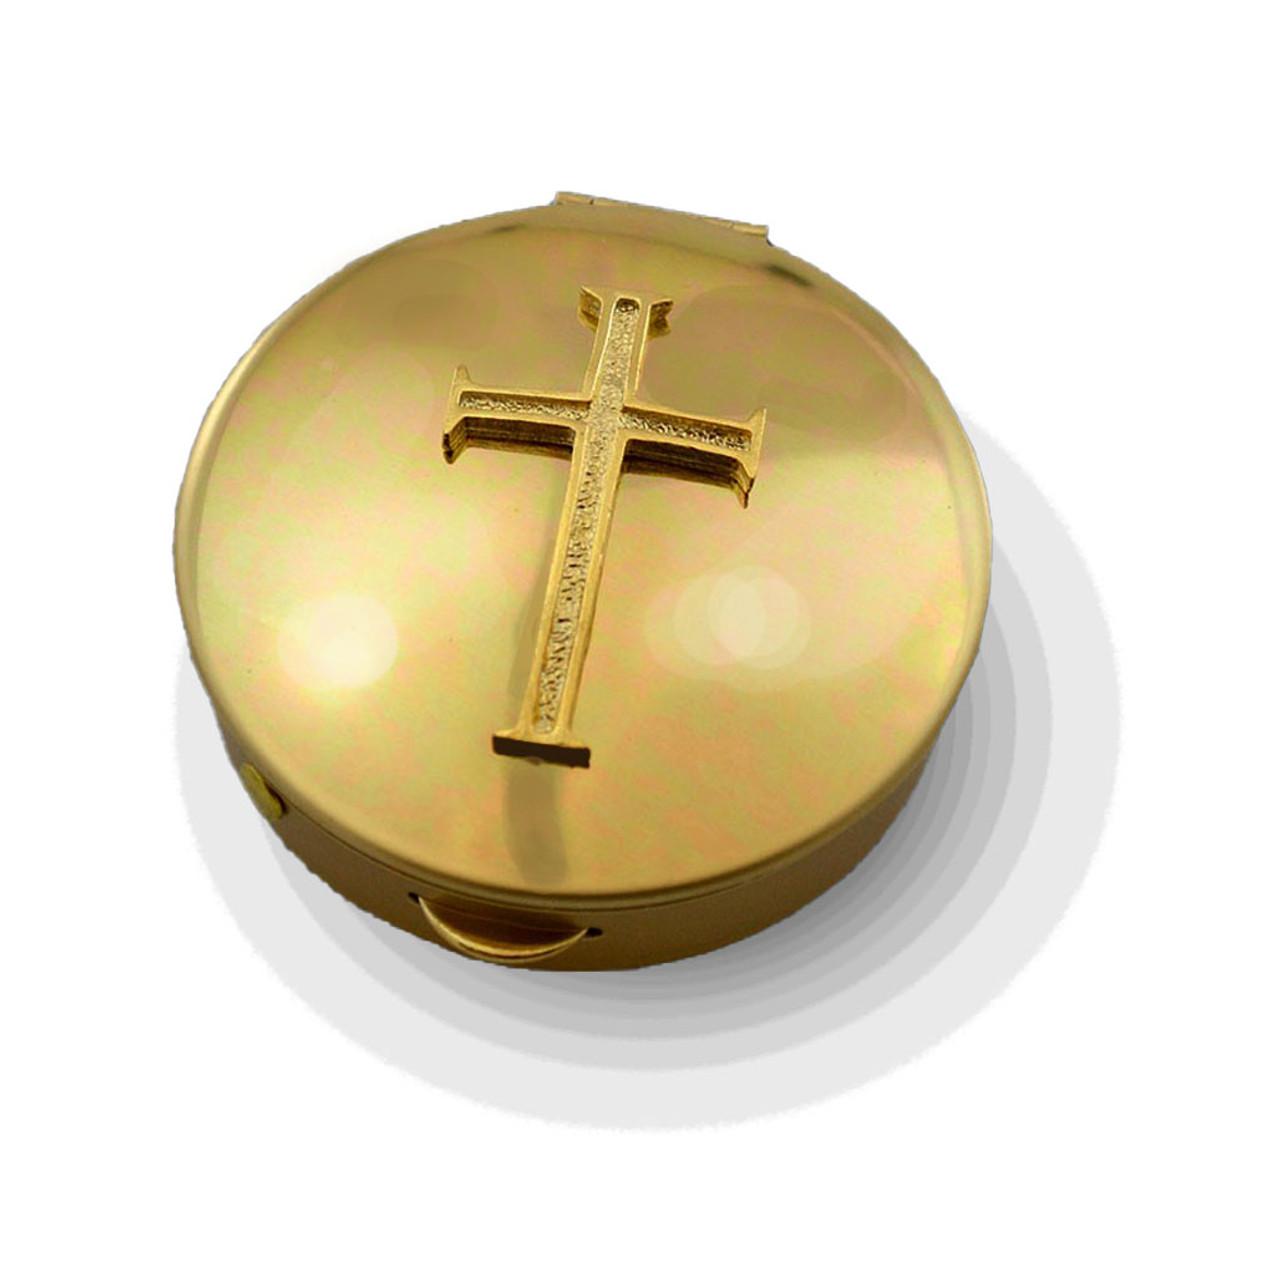 PS 202 Brass Pyx with Latin Cross